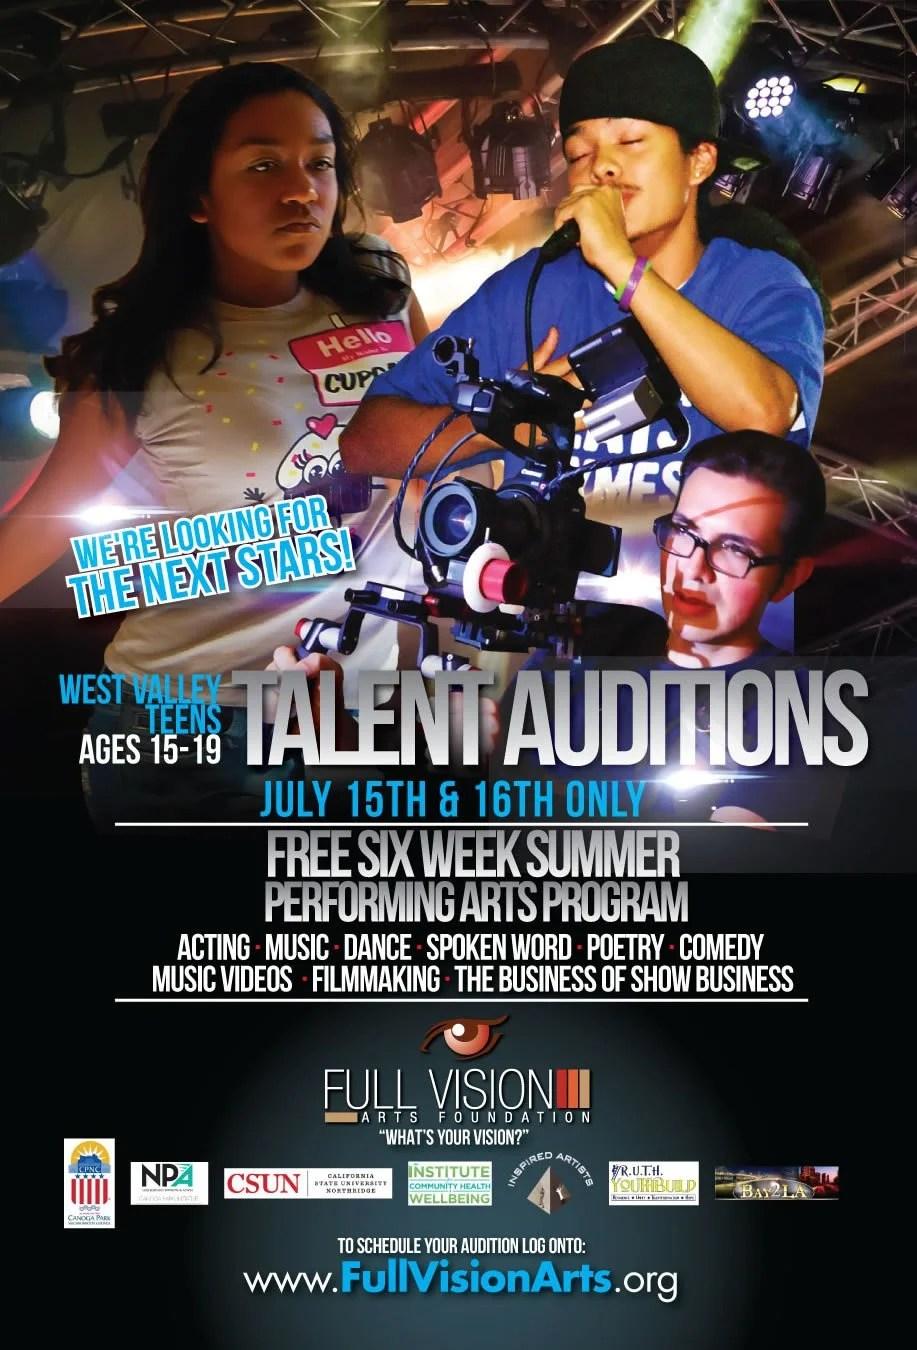 Free Six Week Summer Performing Arts Program in Canoga Park!